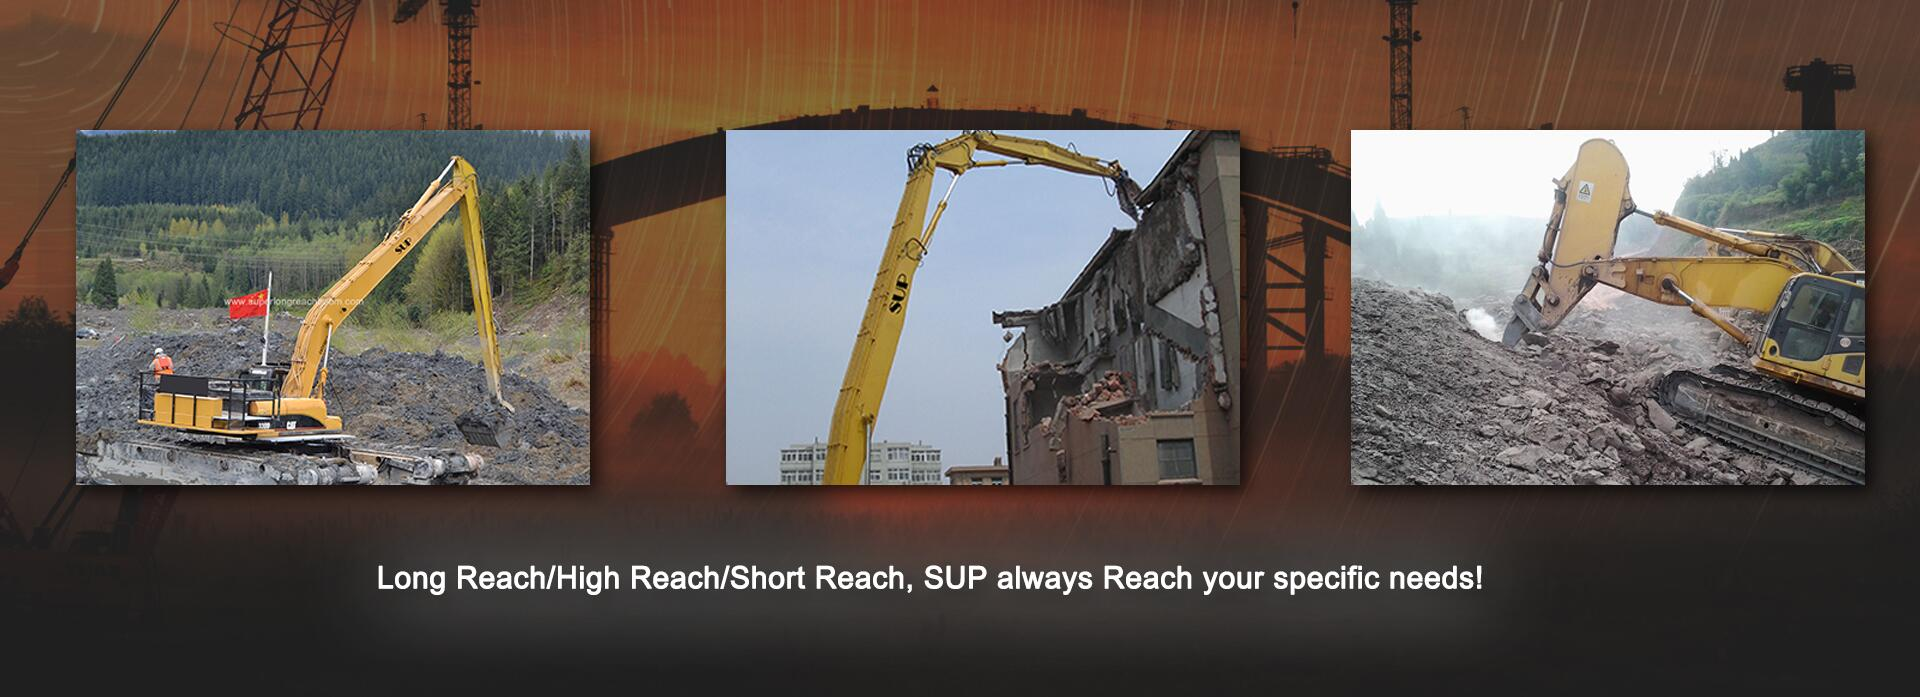 SUP Construction Equipment Co.,Ltd. Main Image